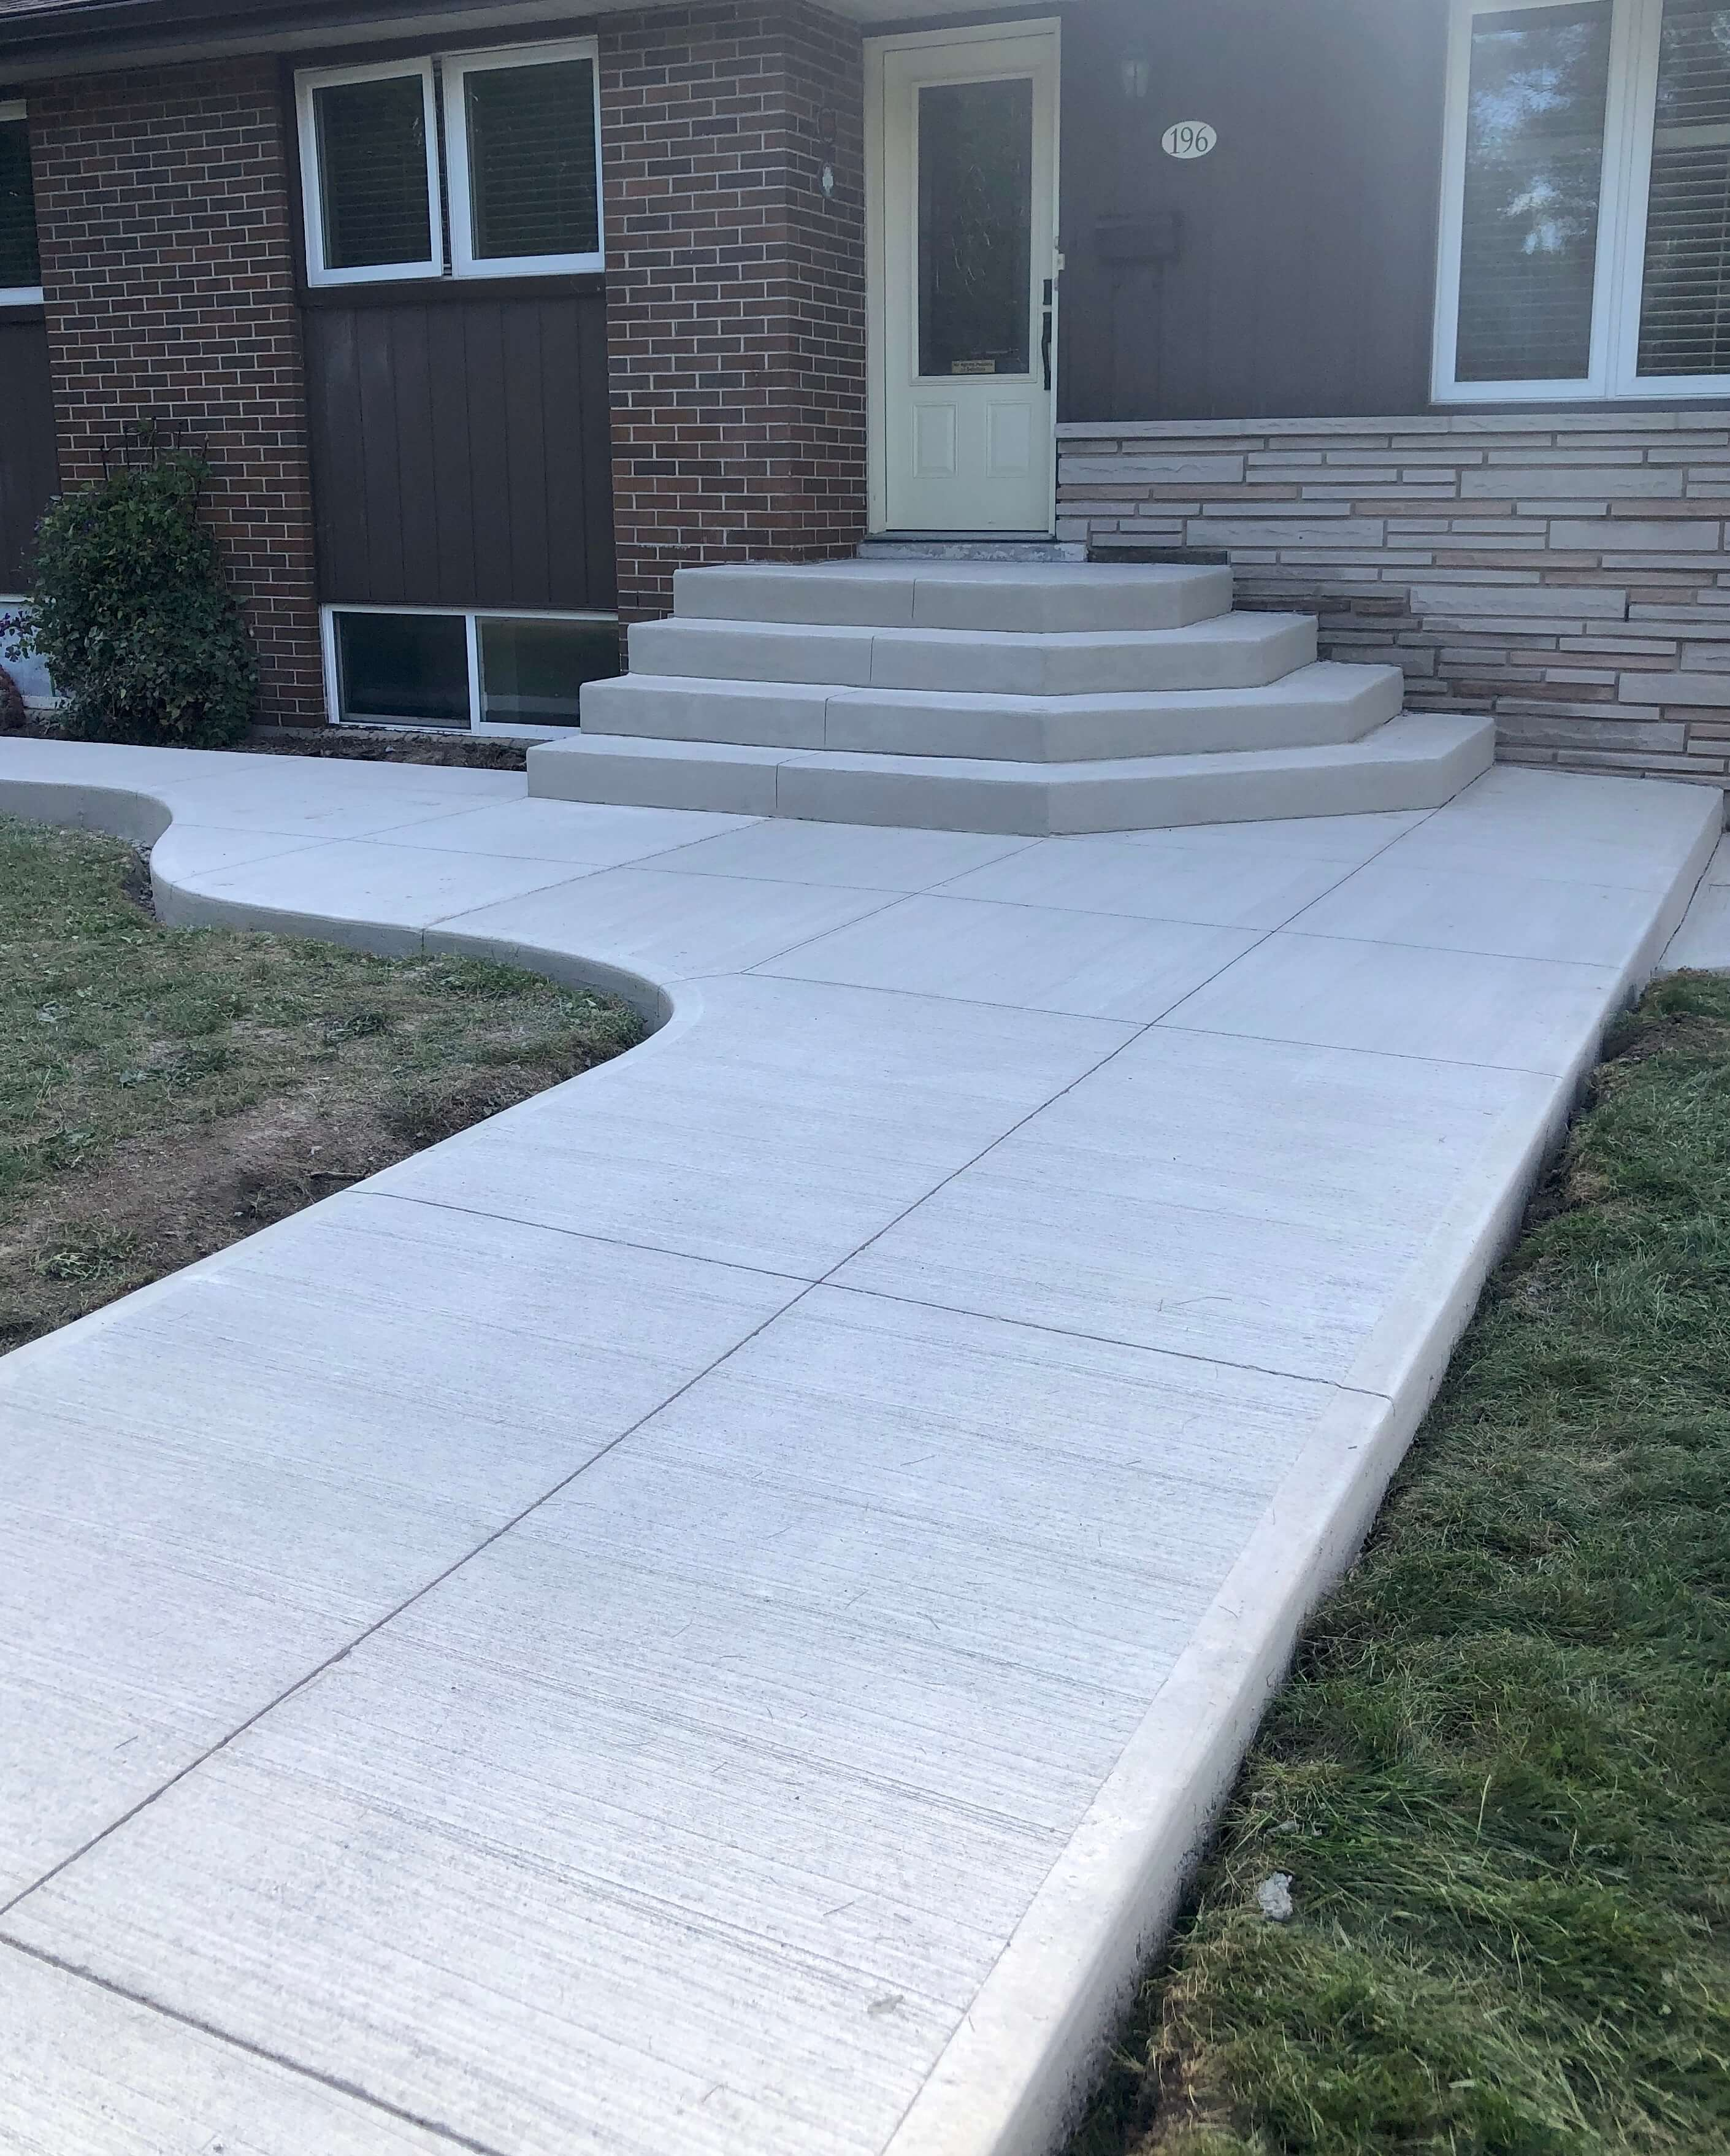 Broom Finish Walkway and Stairs